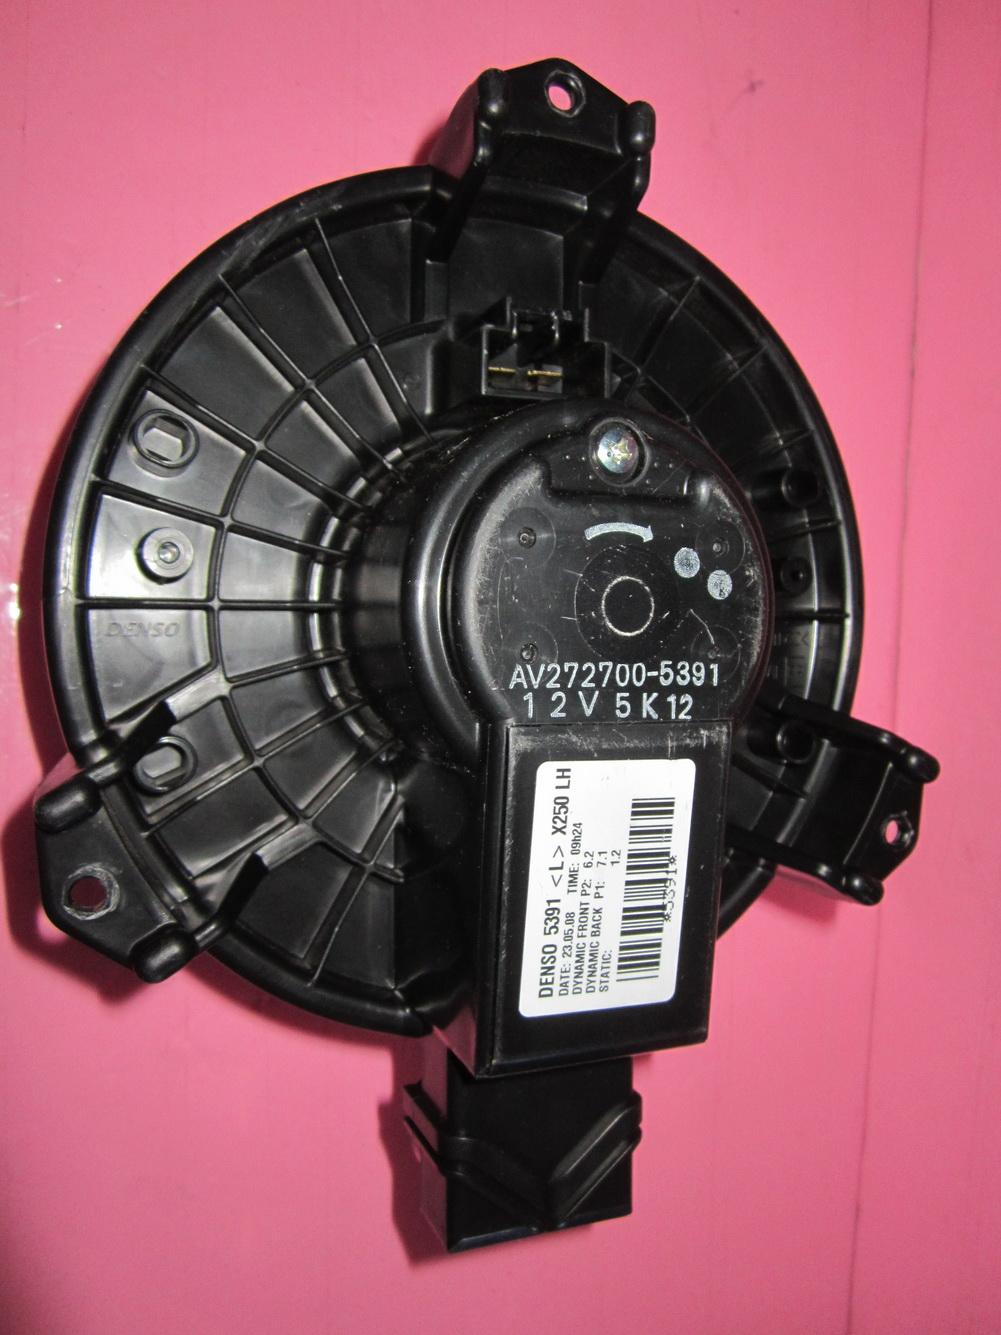 jaguar xf heater blower fan motor interior vent av272700 5391 used auto parts mercedes benz. Black Bedroom Furniture Sets. Home Design Ideas